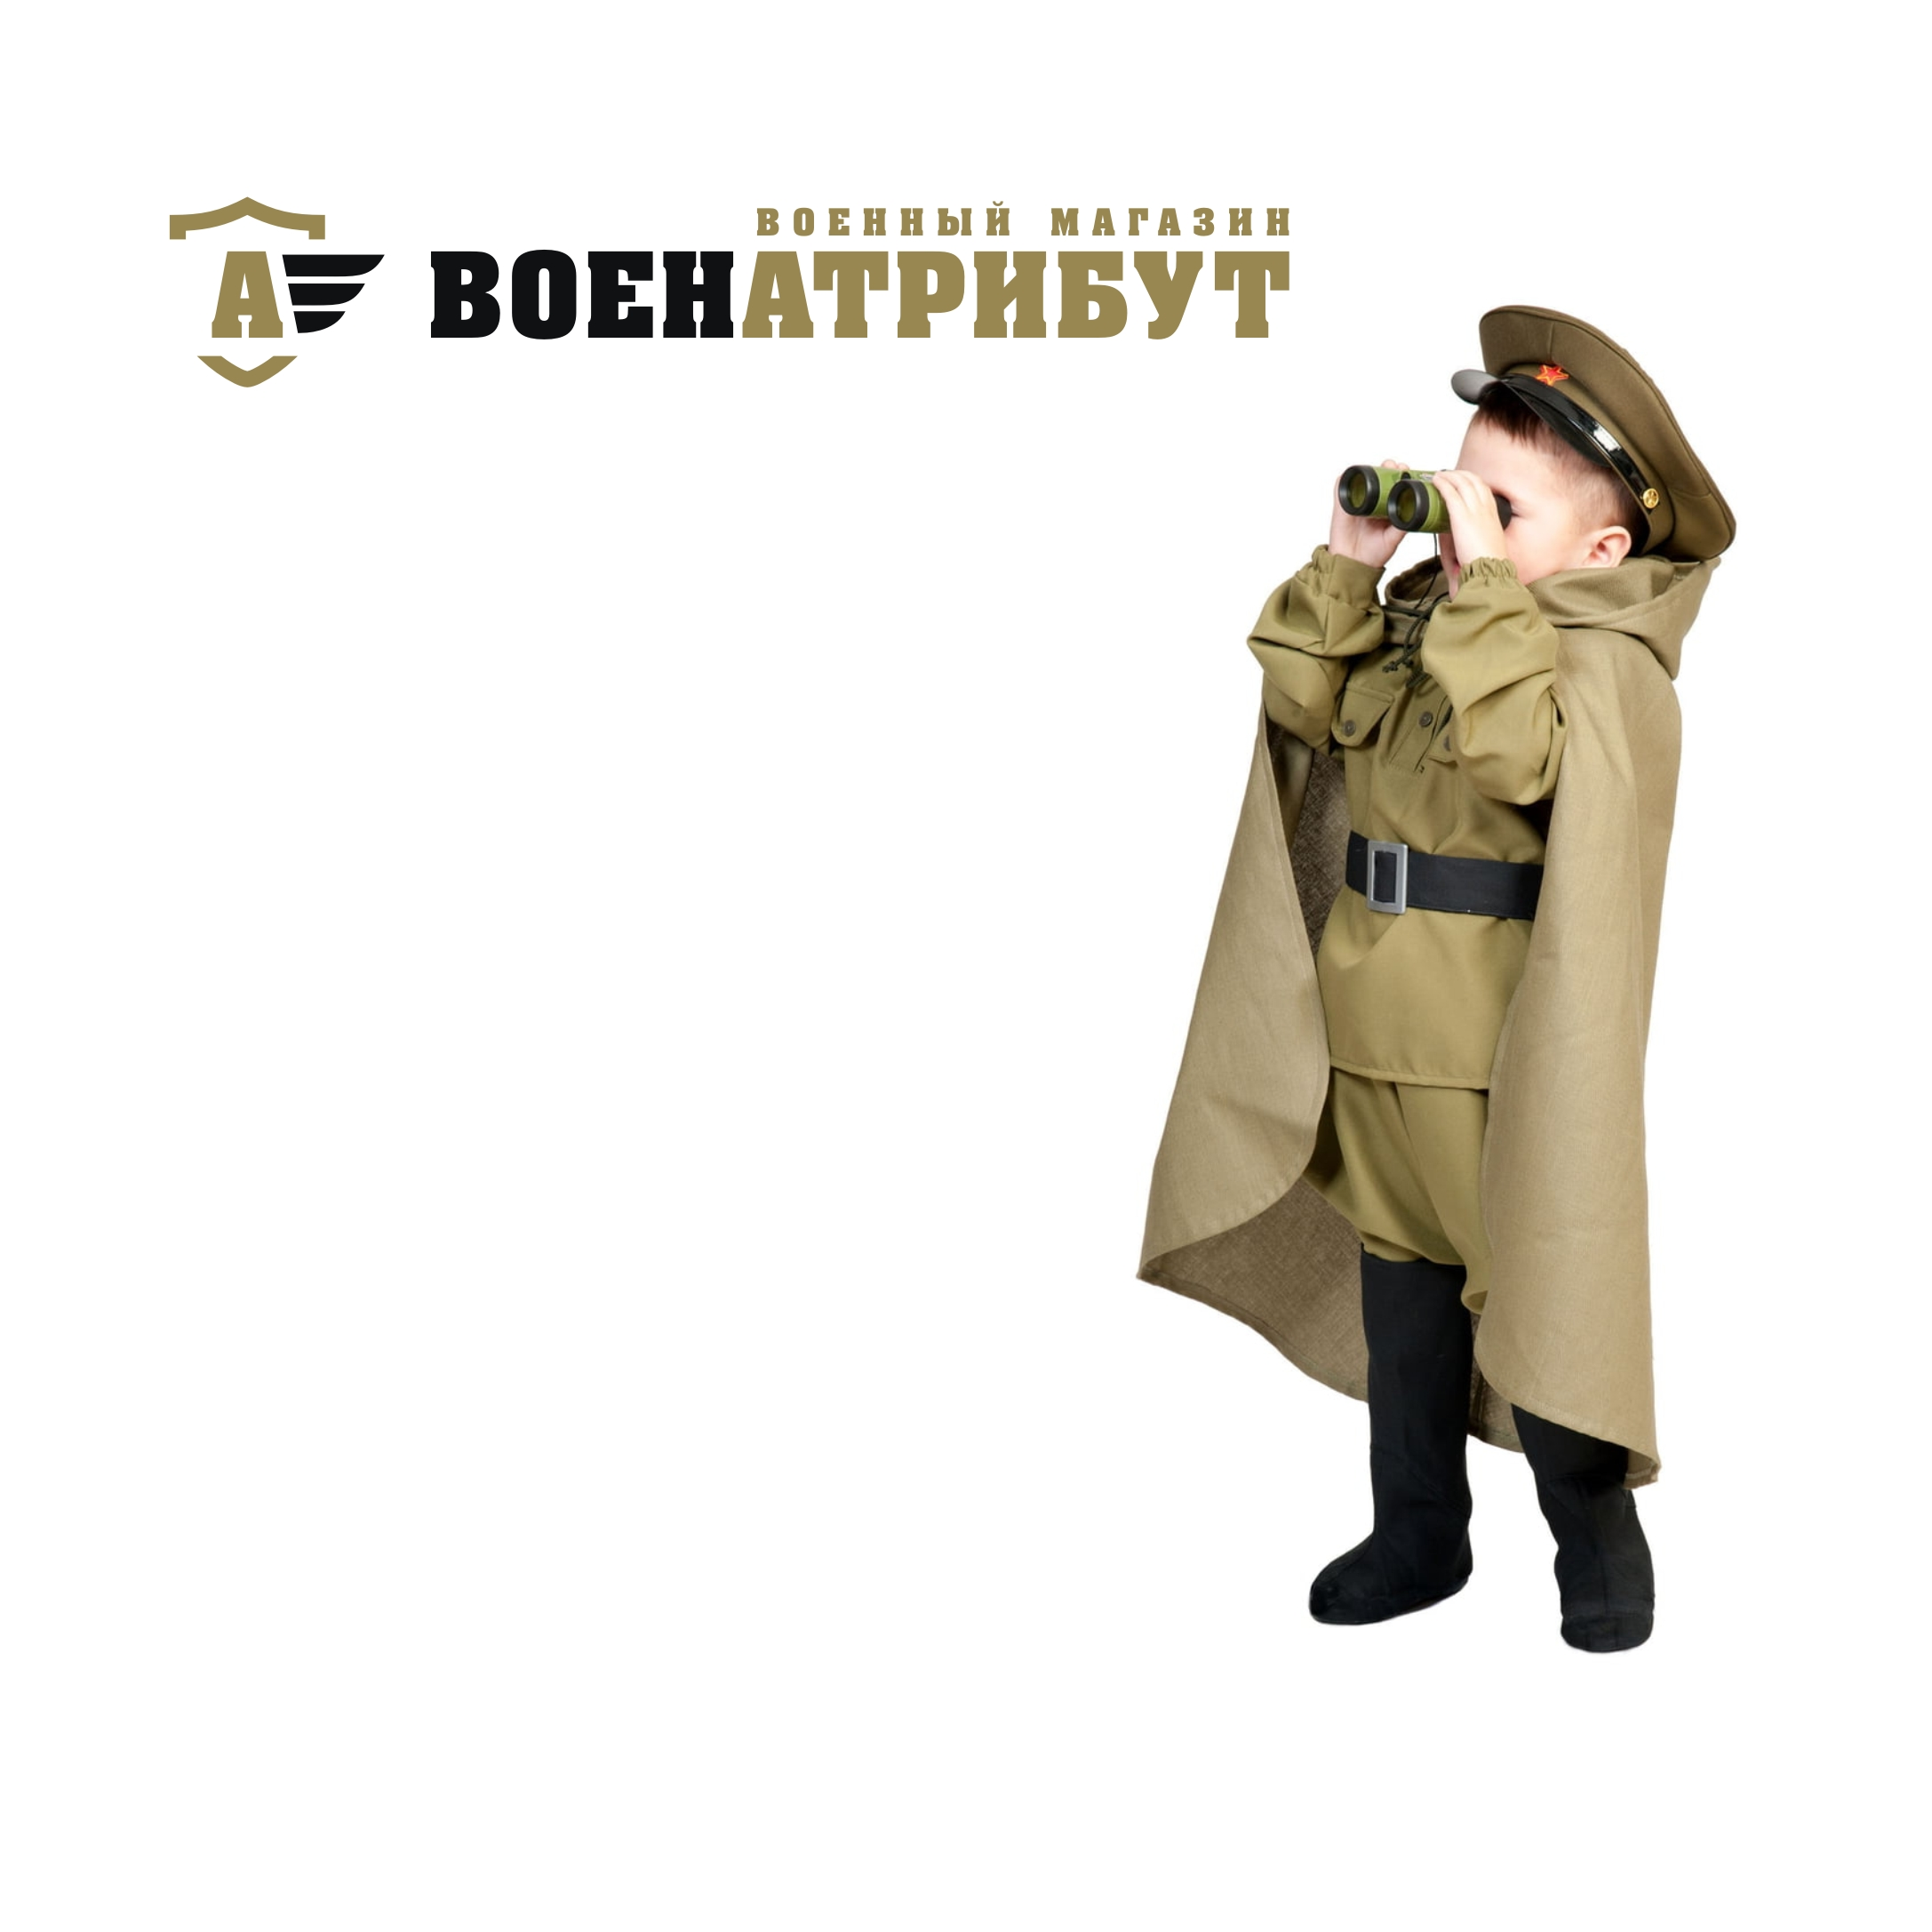 Разработка логотипа для компании военной тематики фото f_9226023ac3cb7e11.jpg